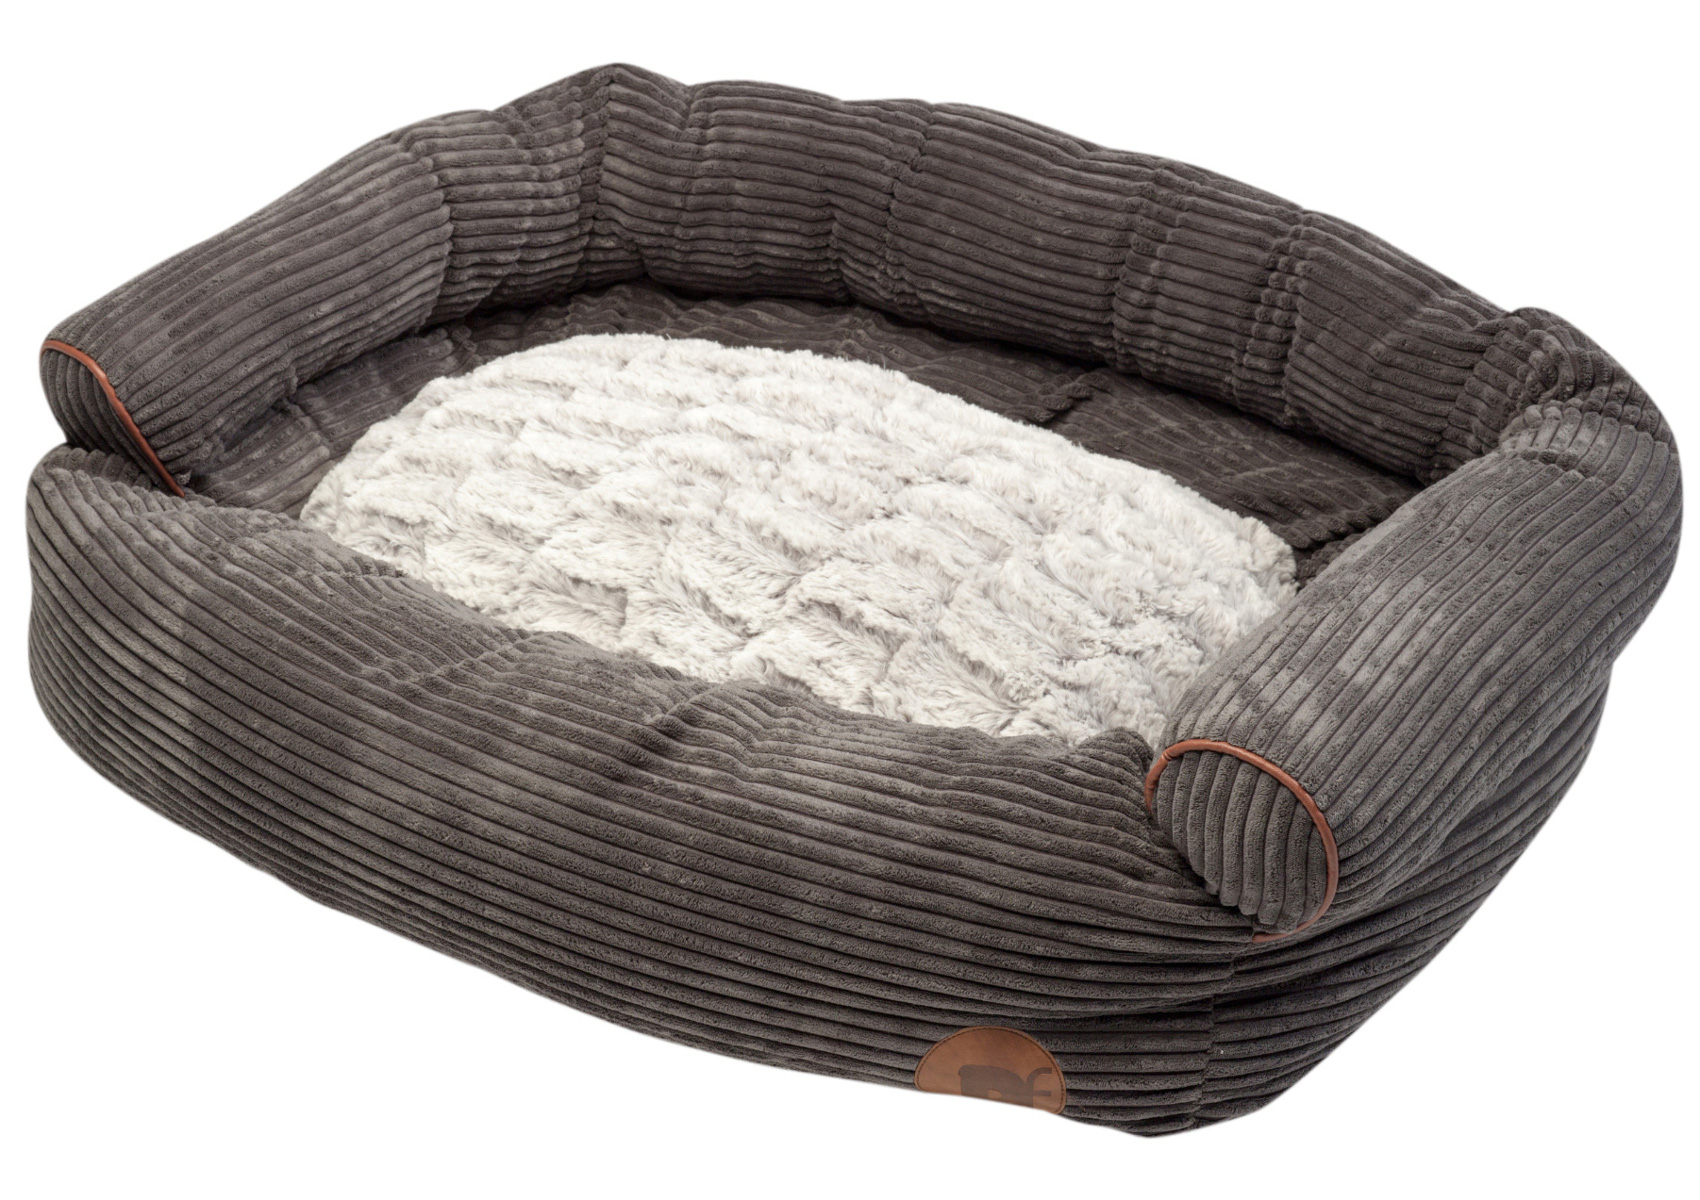 Jumbo Dog Bed Petface Corduroy XL Sofa Style Pet Basket Faux Fur